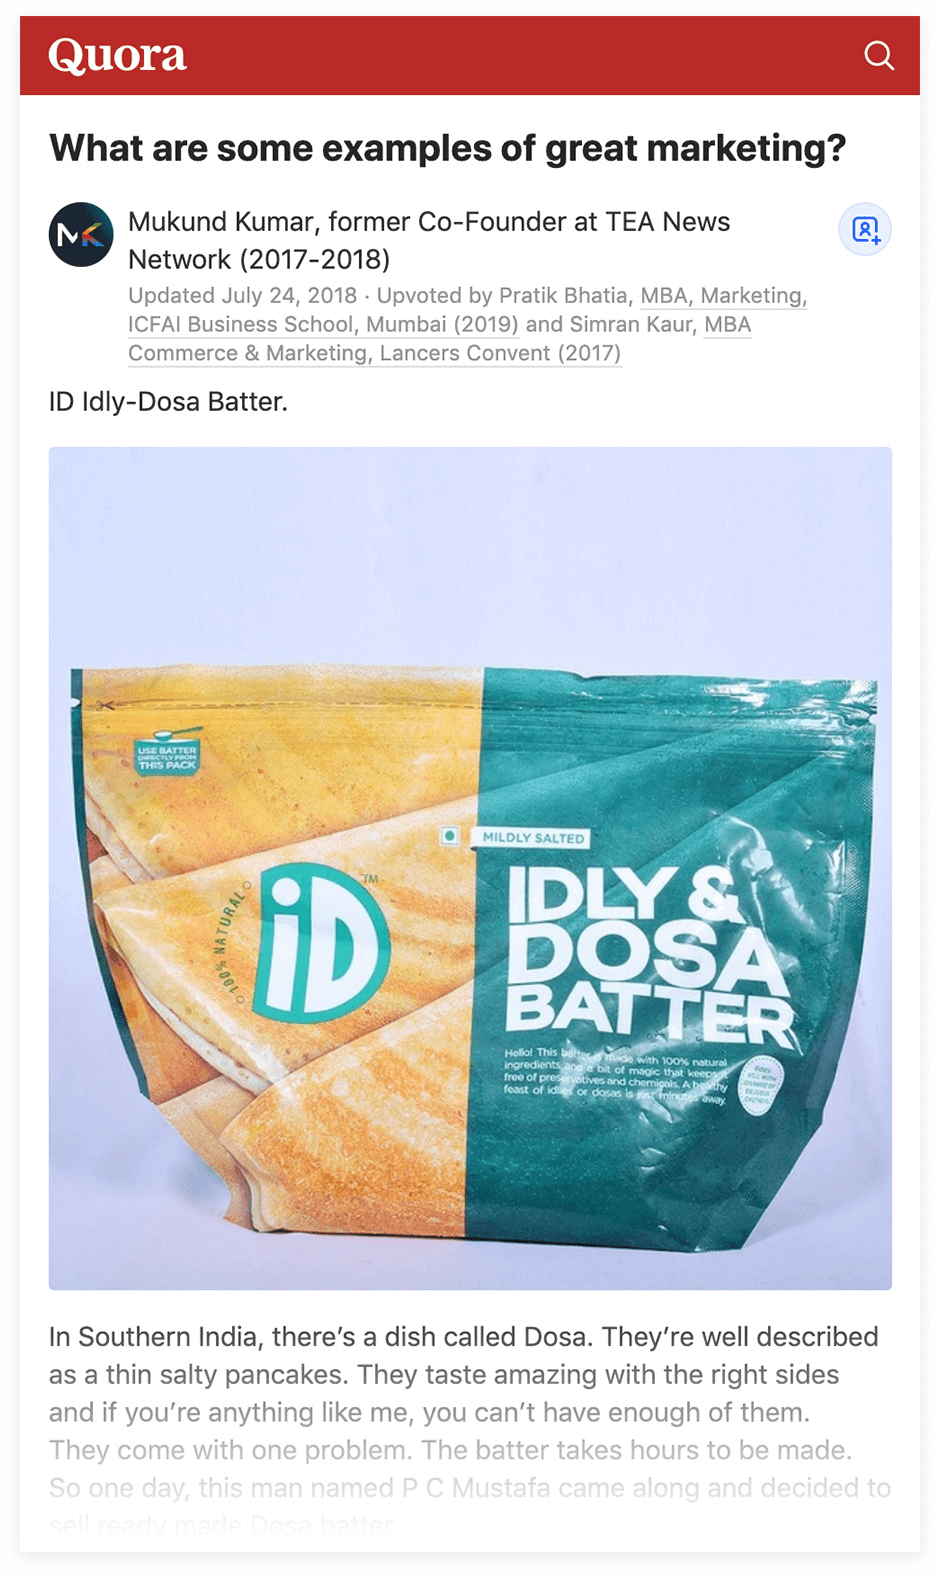 Quora - Dosa Batter example